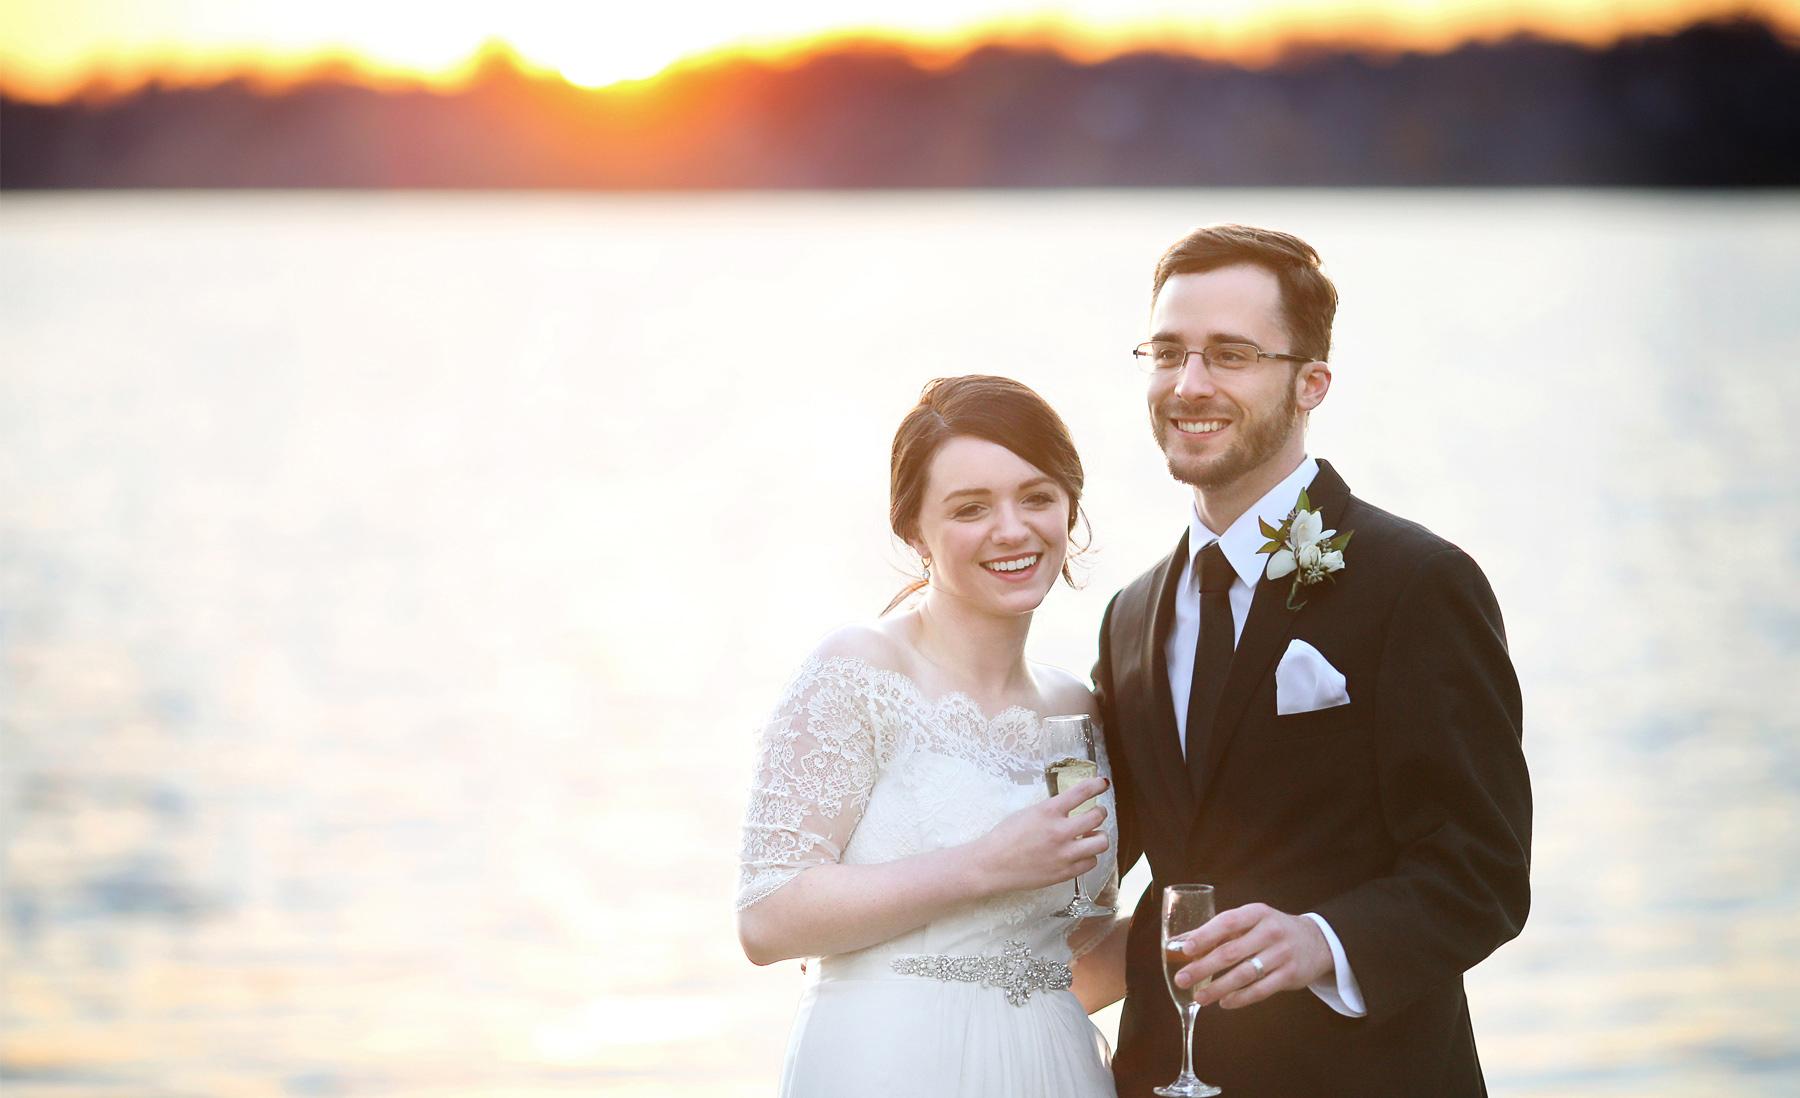 10-Minneapolis-Minnesota-Wedding-Photography-by-Vick-Photography-Autumn-Lake-Sunset-Toasting-Sarah-and-Patrick.jpg